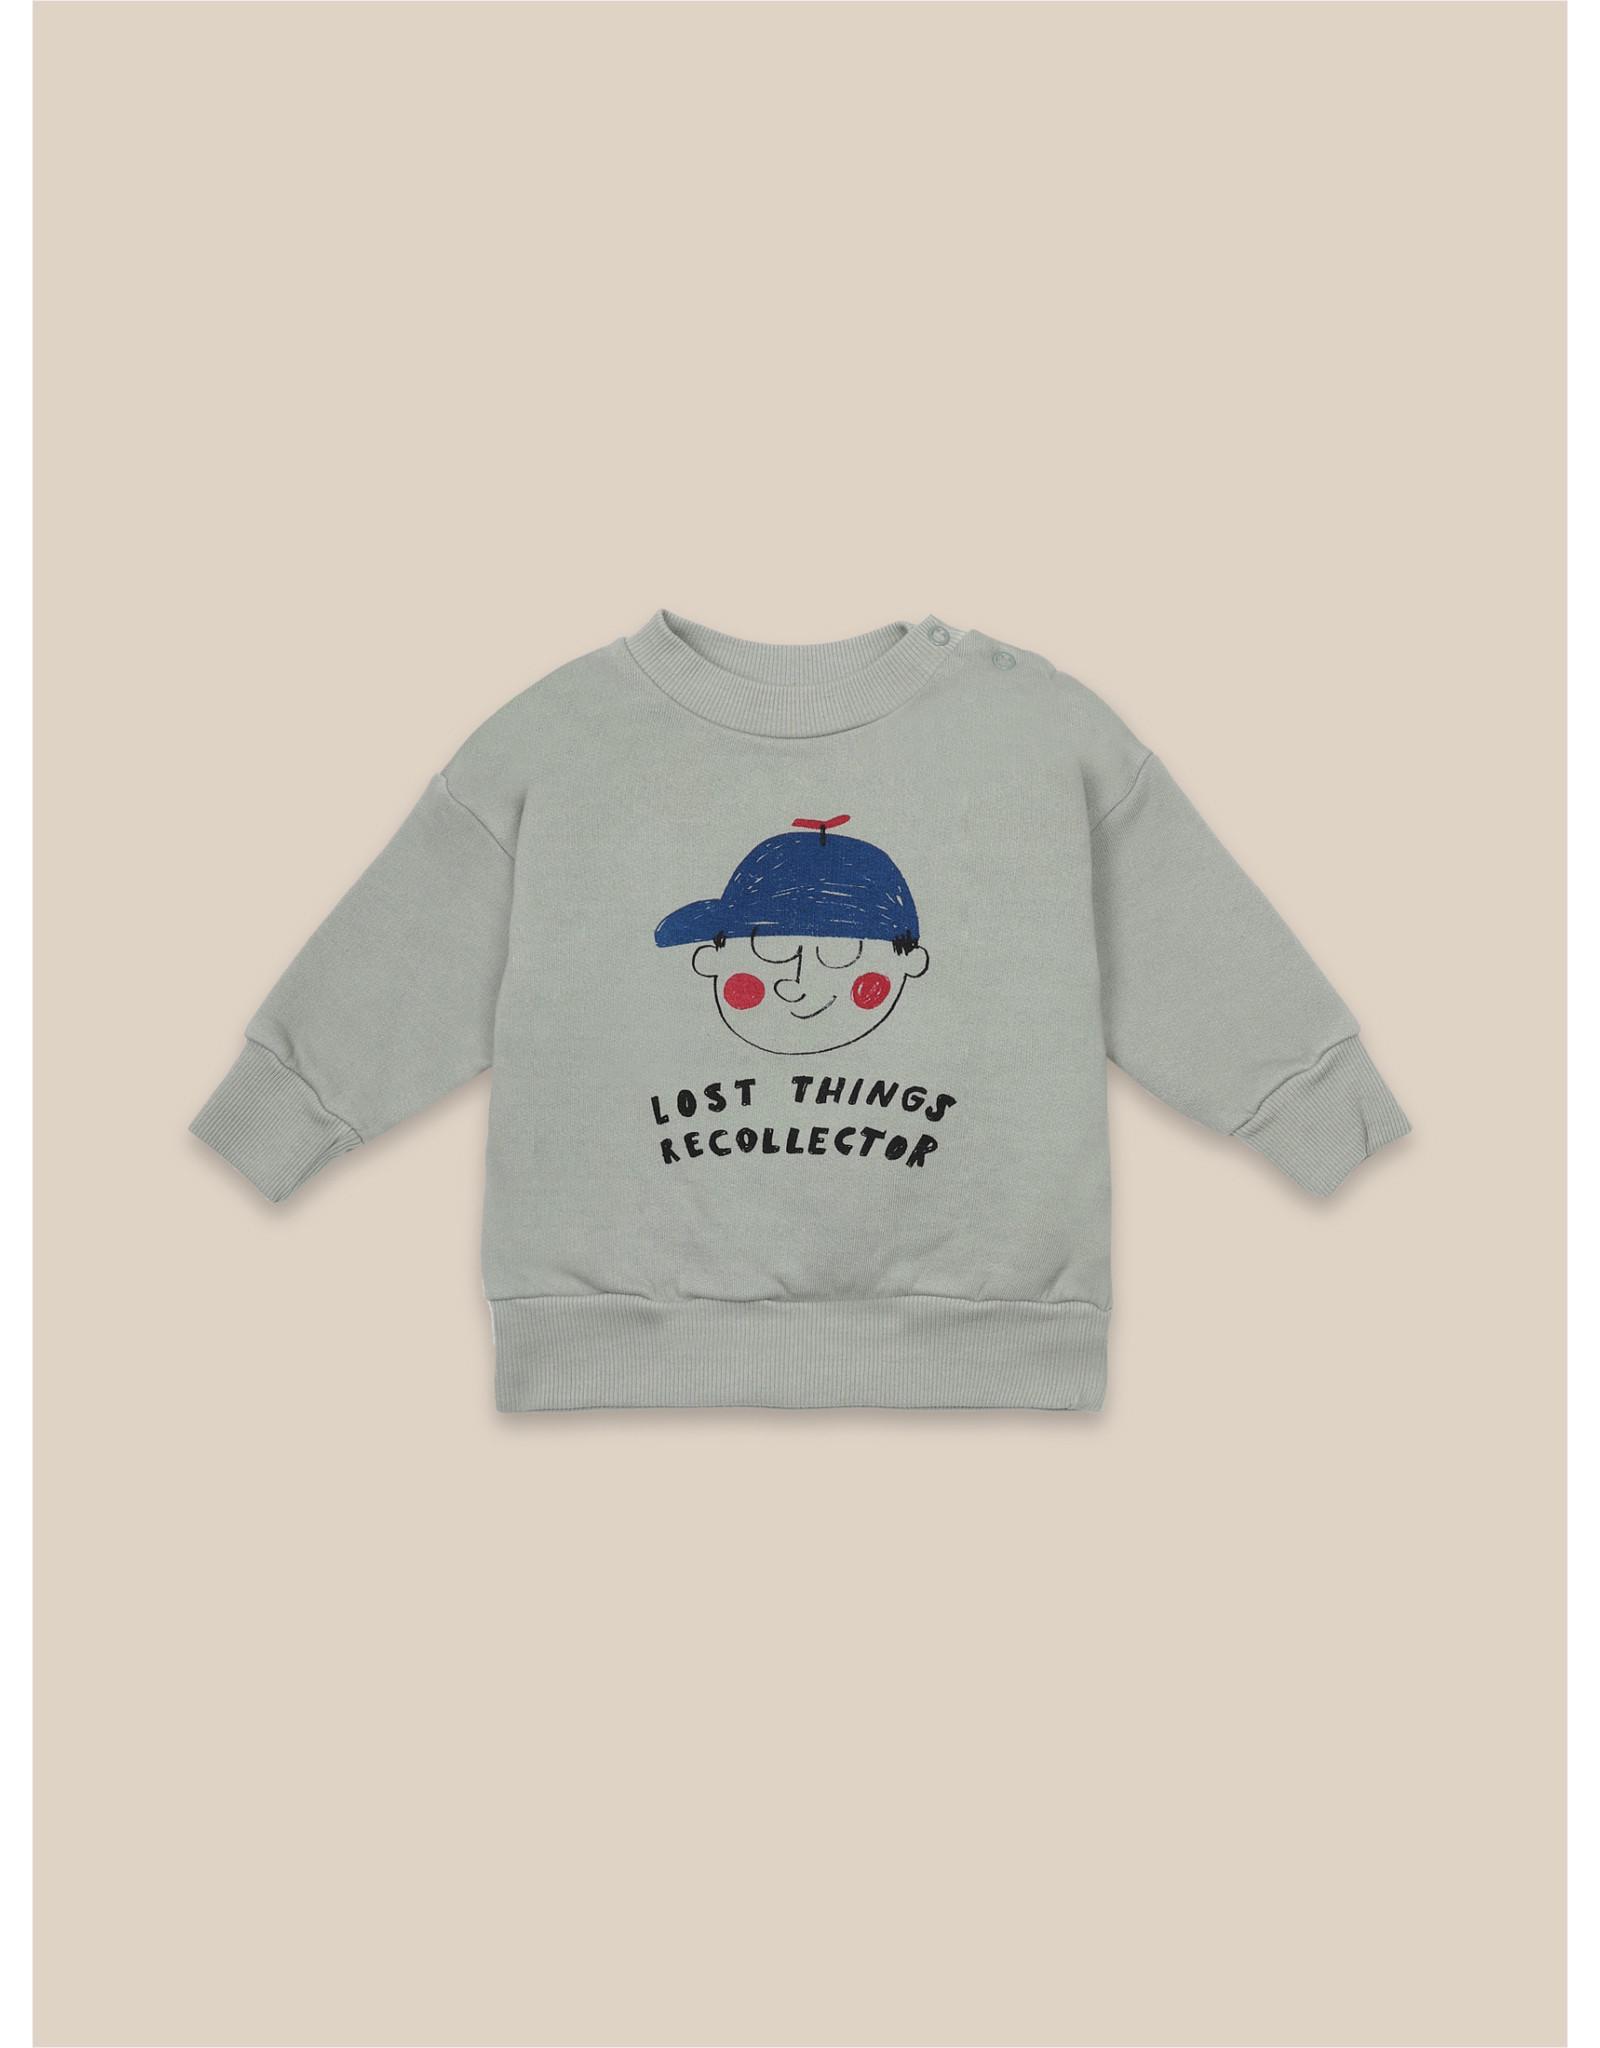 Bobo Choses Bobo Choses Boy Sweatshirt